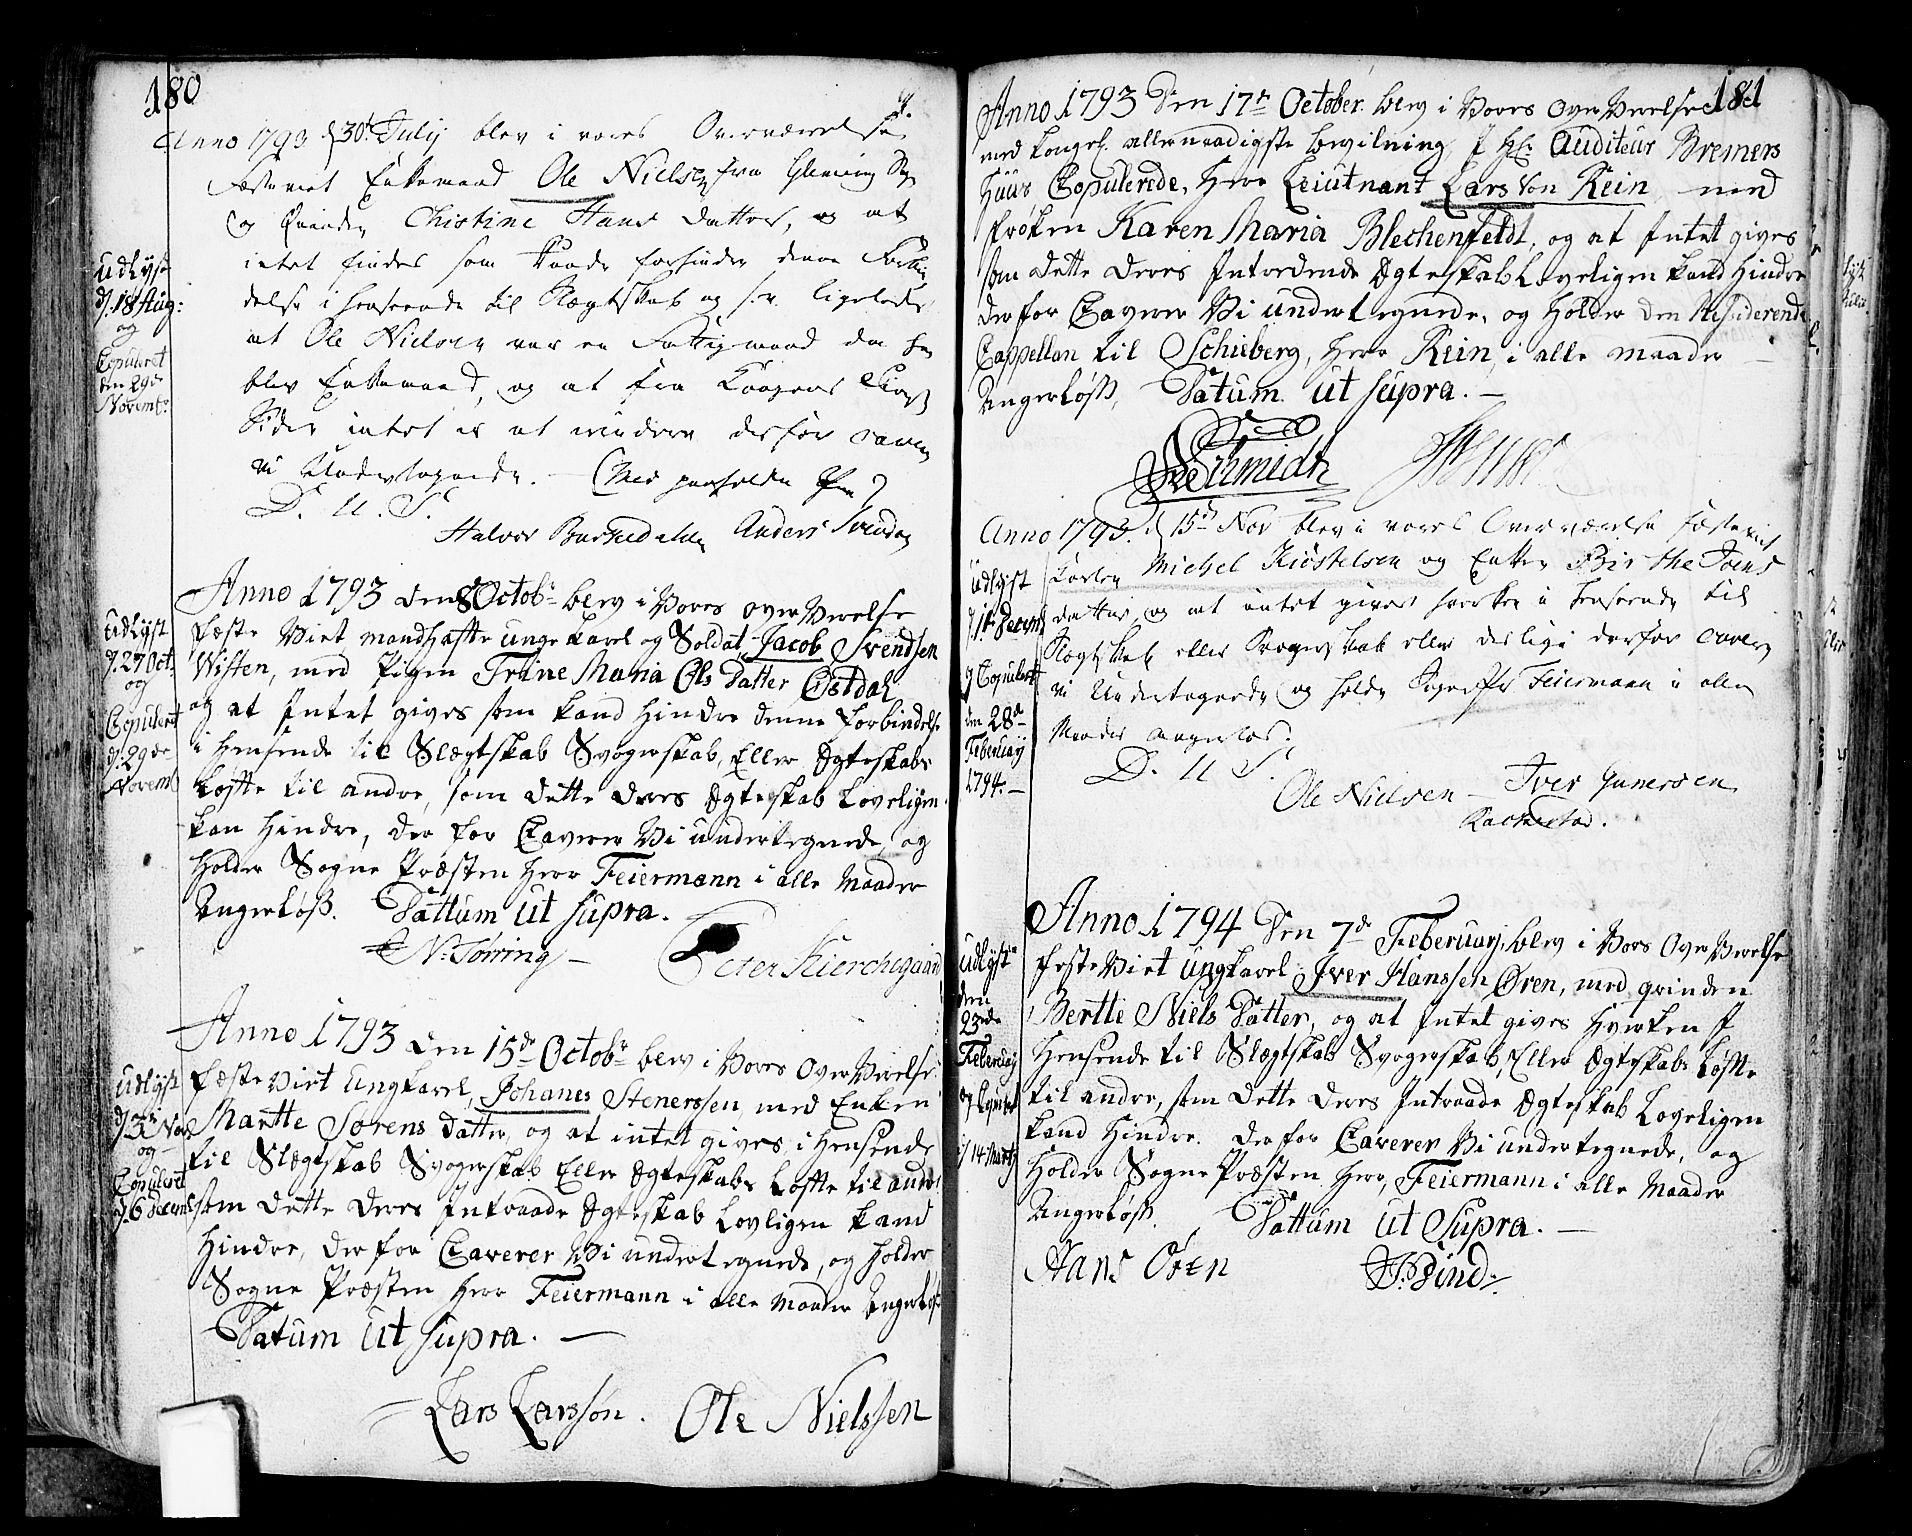 SAO, Fredrikstad prestekontor Kirkebøker, F/Fa/L0002: Ministerialbok nr. 2, 1750-1804, s. 180-181